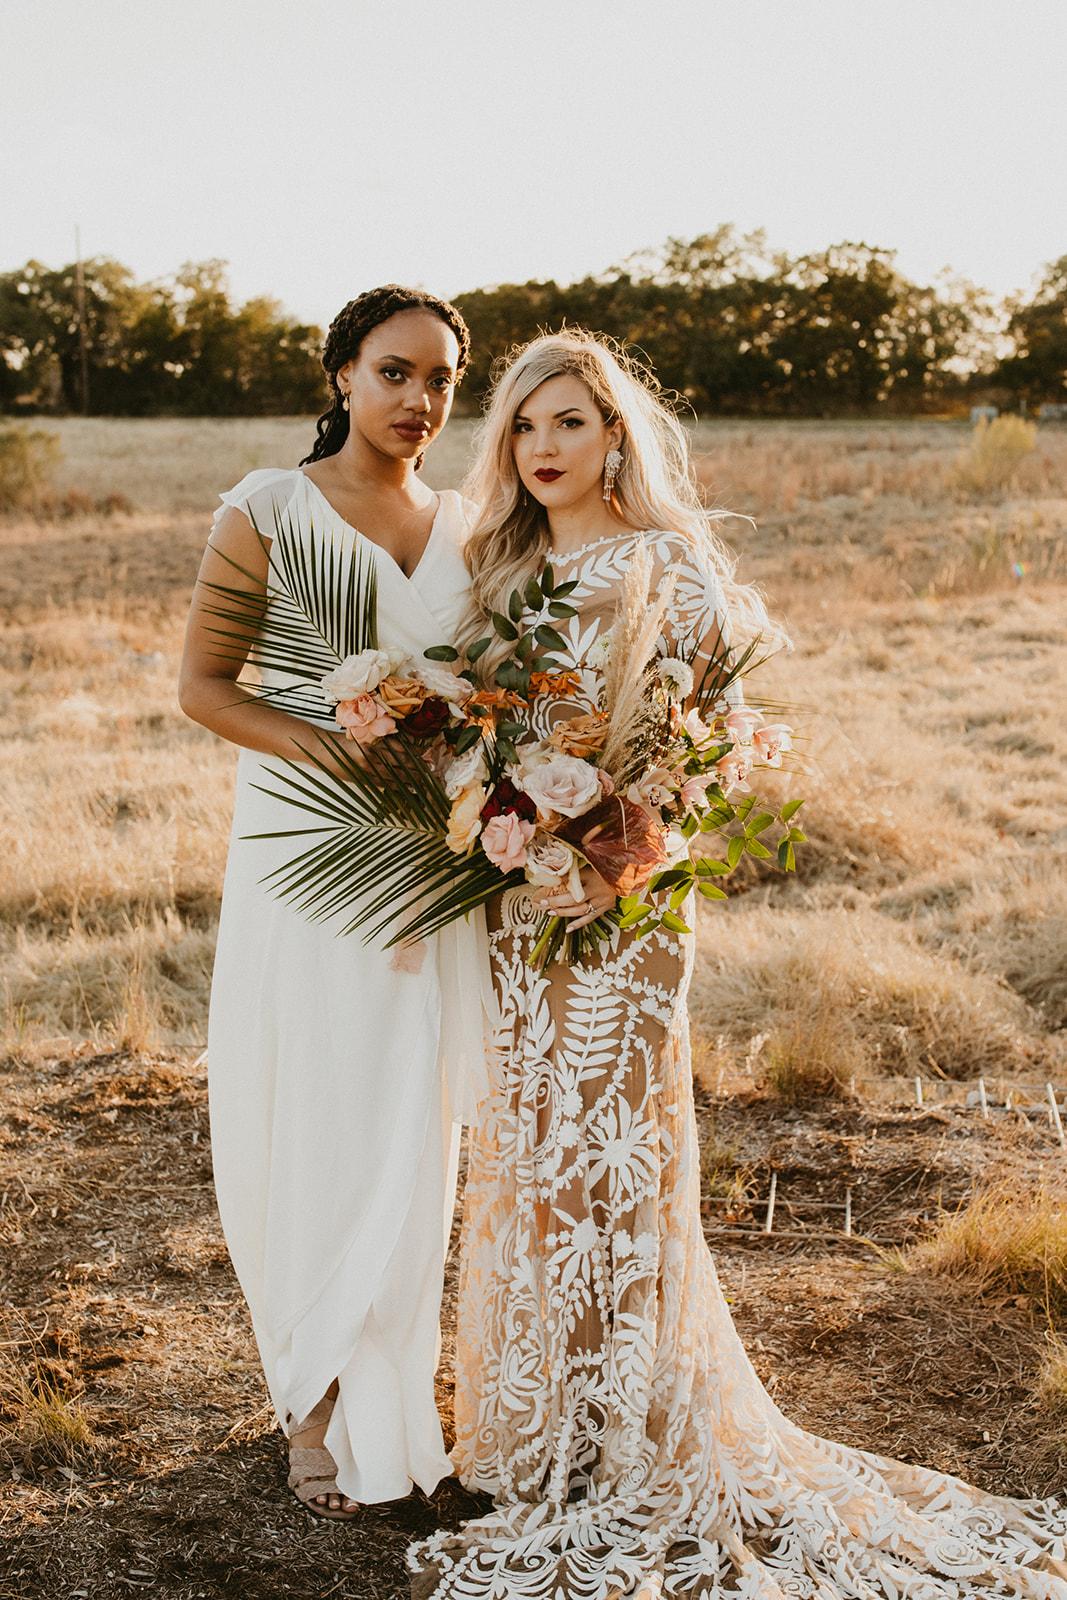 Tropical Colorful Frond Bridesmaid + Bride Bouquets + White Creamy Bridesmaid Dresses + Rue De Seine Wedding Dress + Boho Wedding + telluride wedding photographer century tree